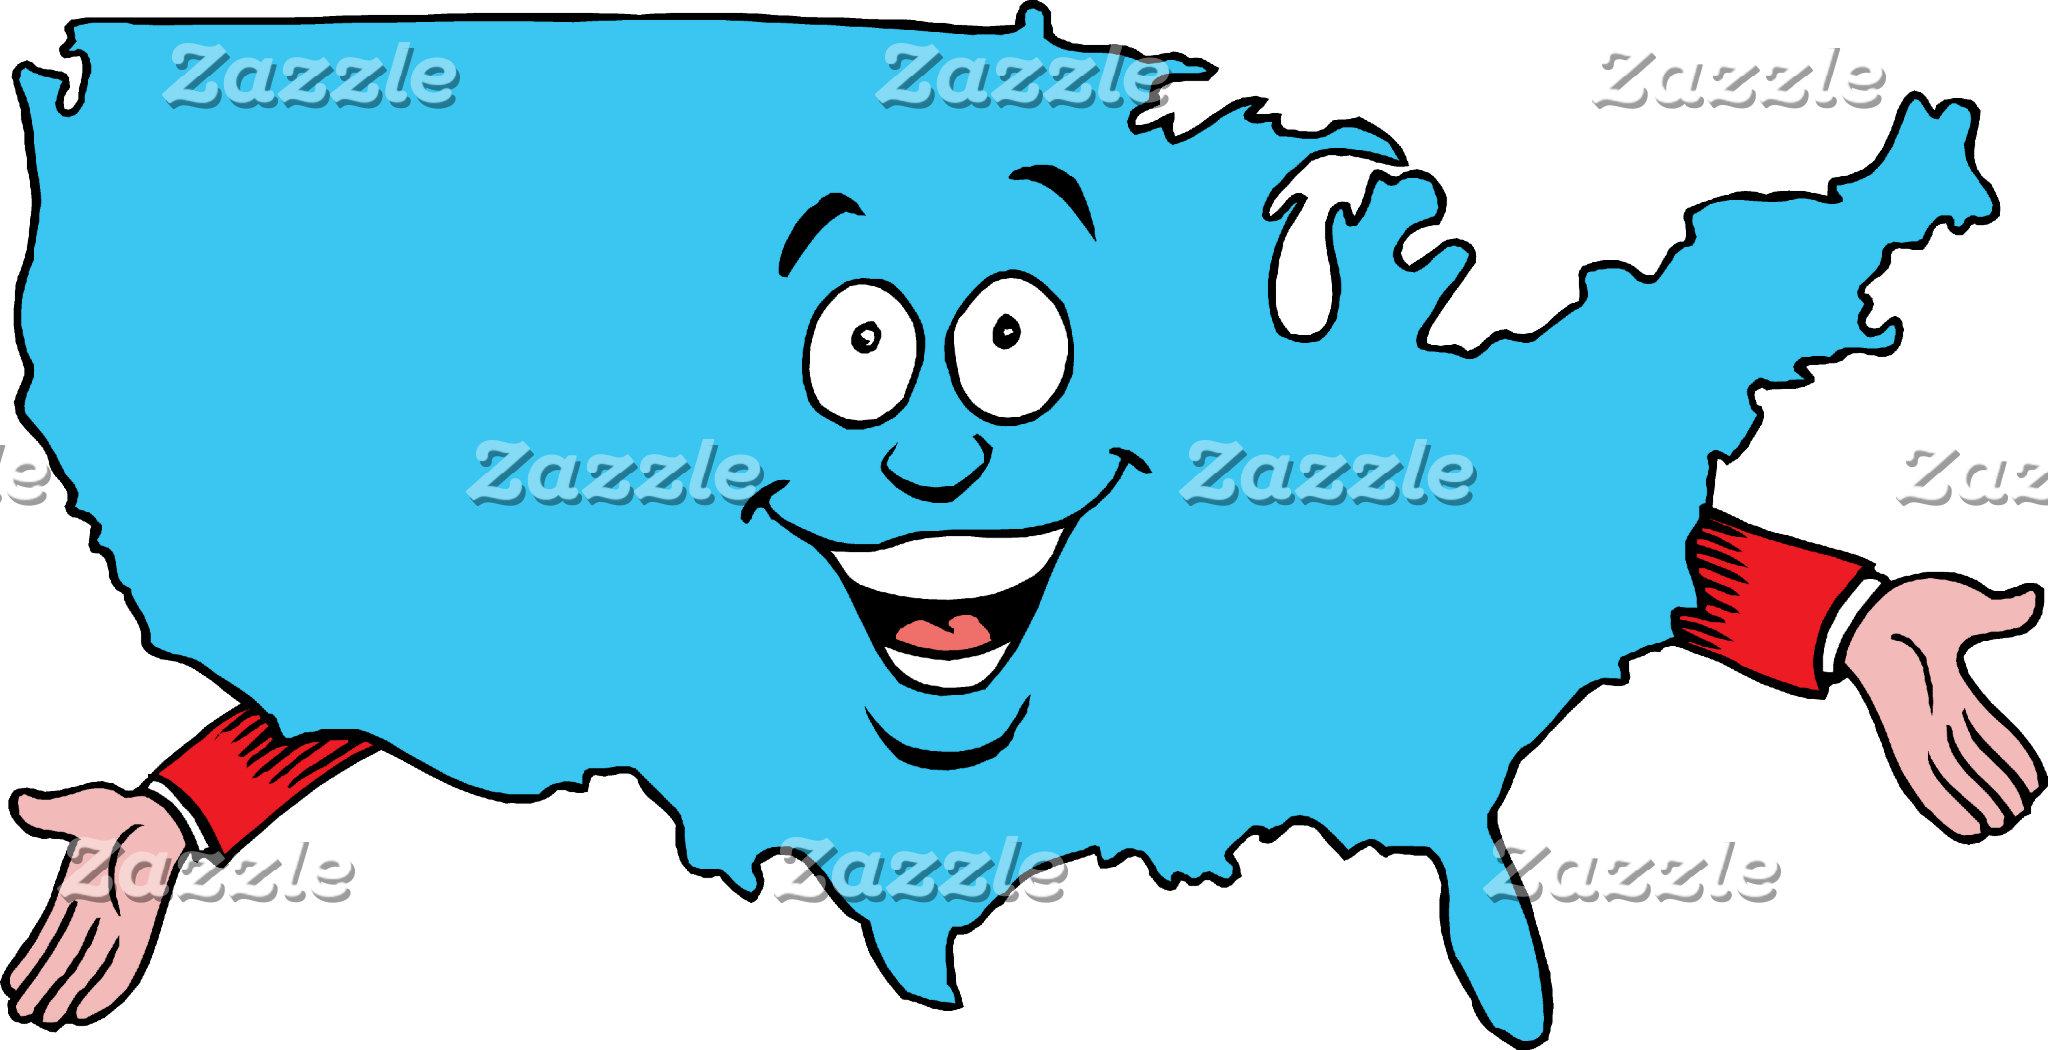 America and World Cartoon Maps